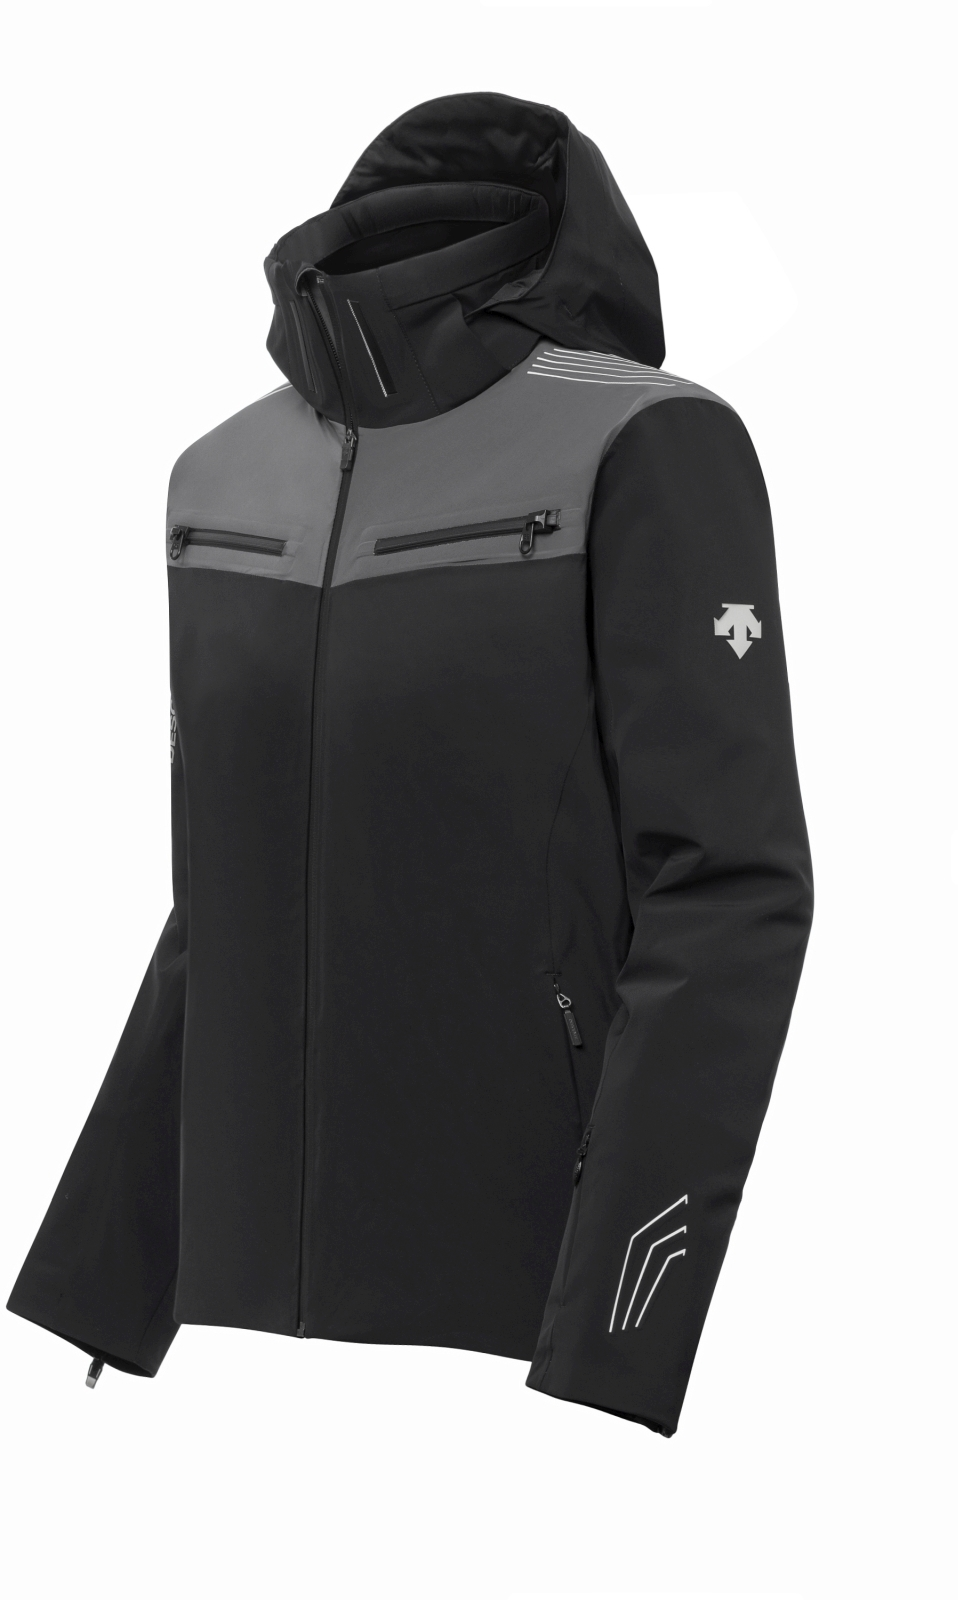 Descente Swiss Ski - black/gun metallic XL